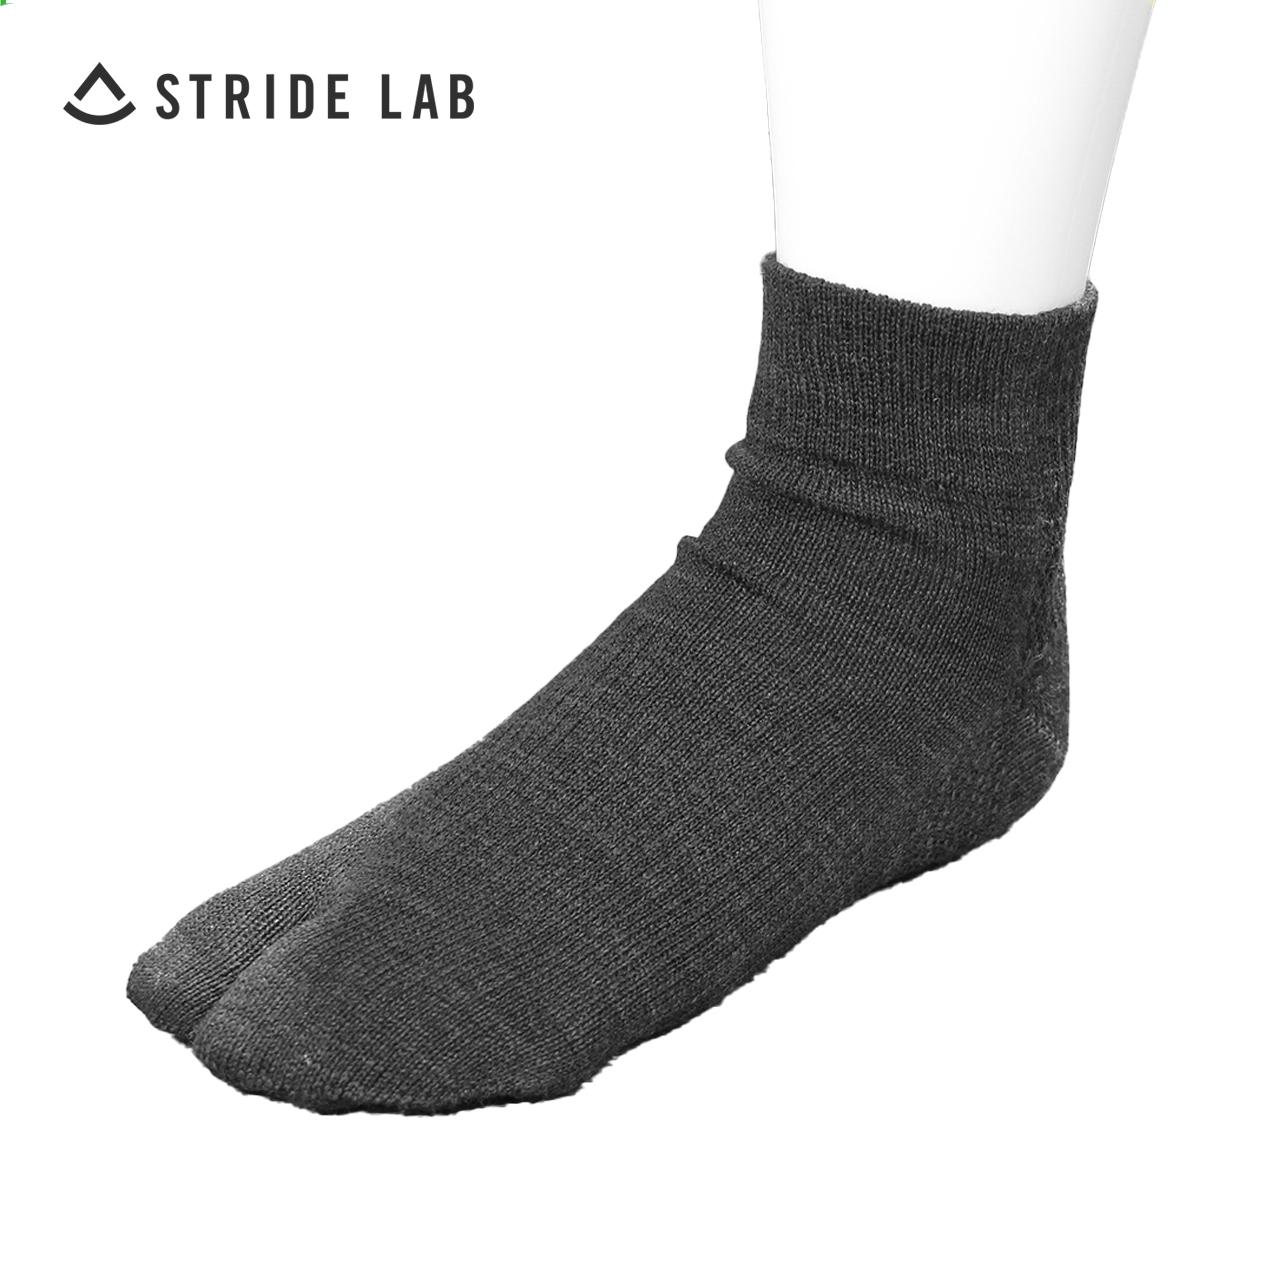 STRIDE LAB Yubi Socks